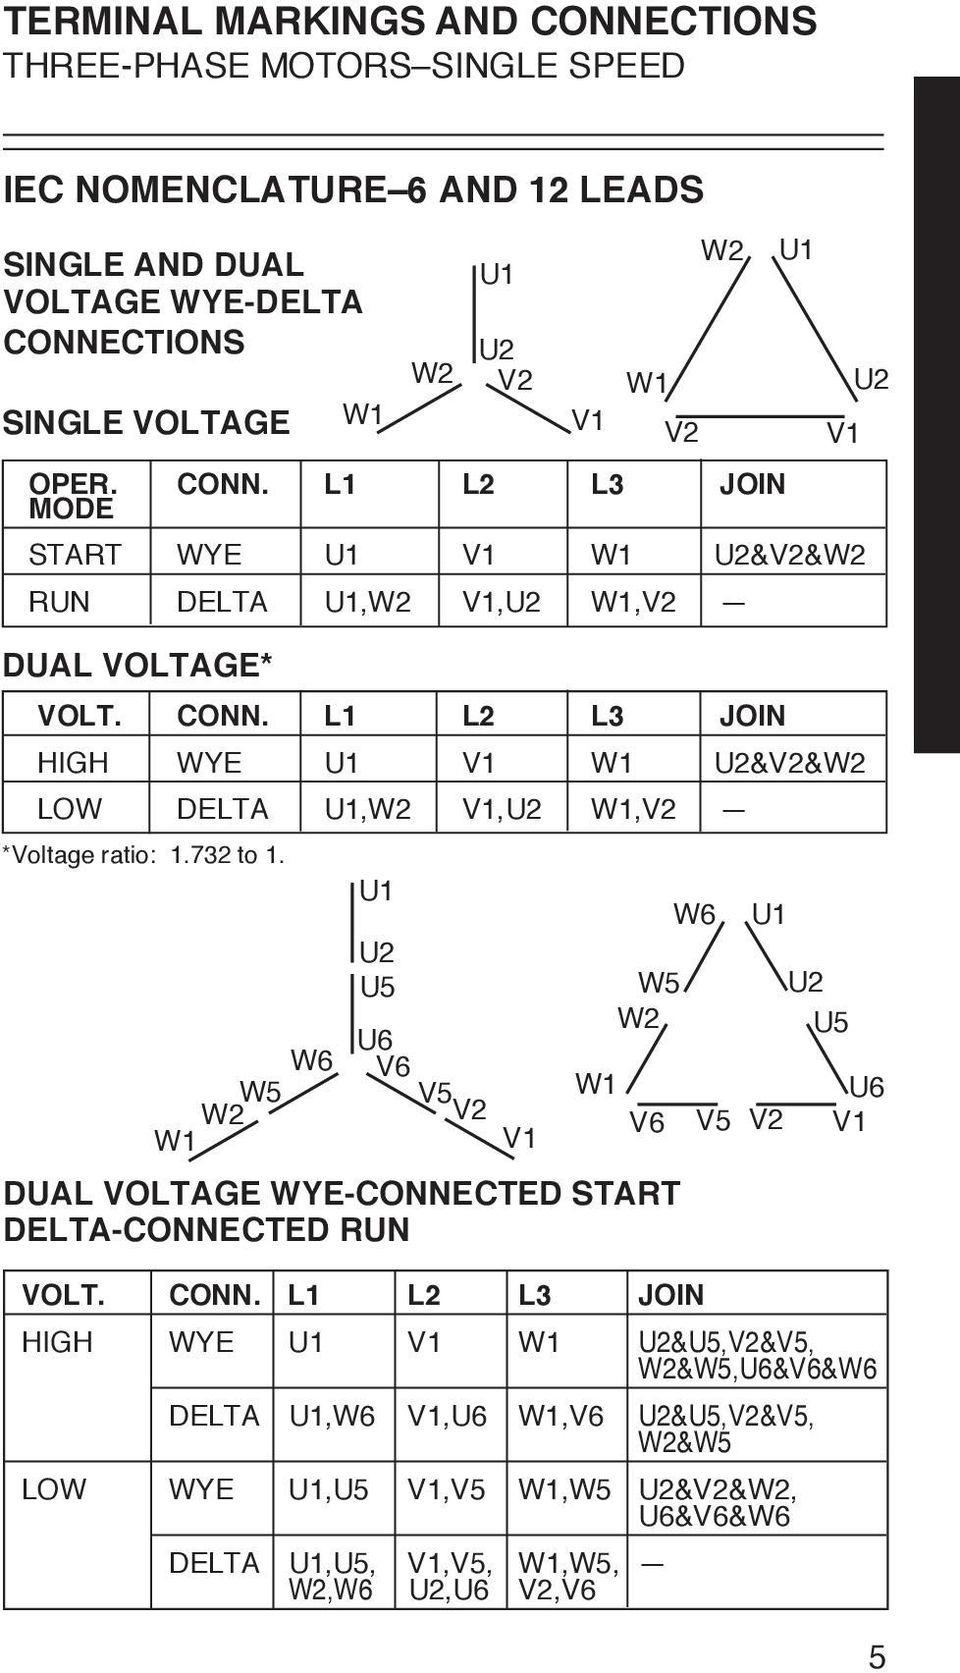 medium resolution of 3 phase motor wiring diagram 12 leads wirings diagram 480 volt motor wiring 12 lead motor